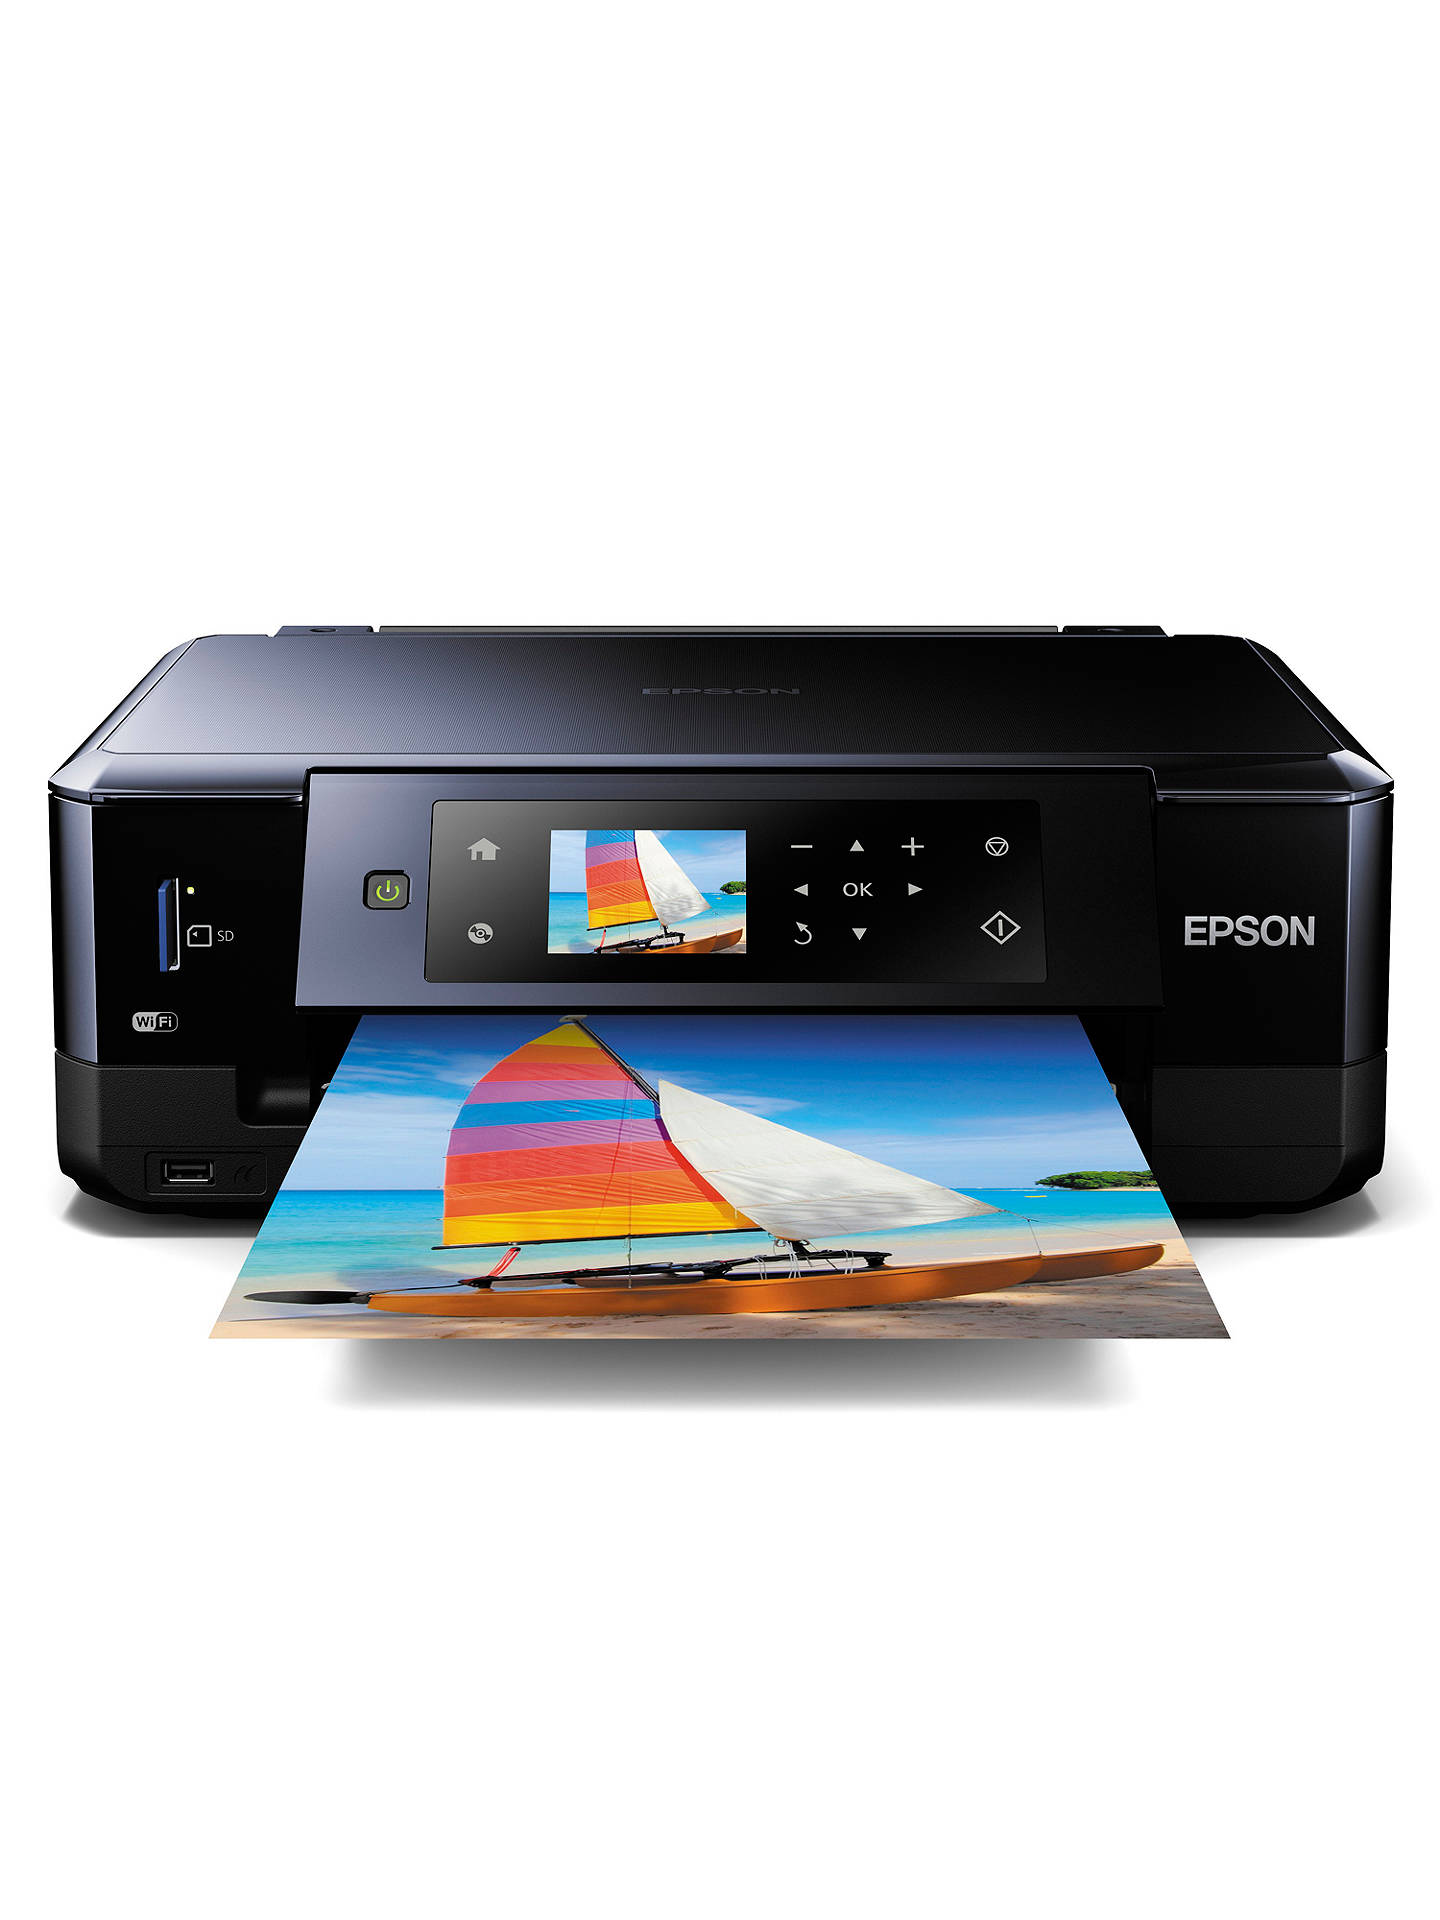 Epson Expression Premium Xp 630 All In One Wireless Printer Black Install Diagram Buyepson Online